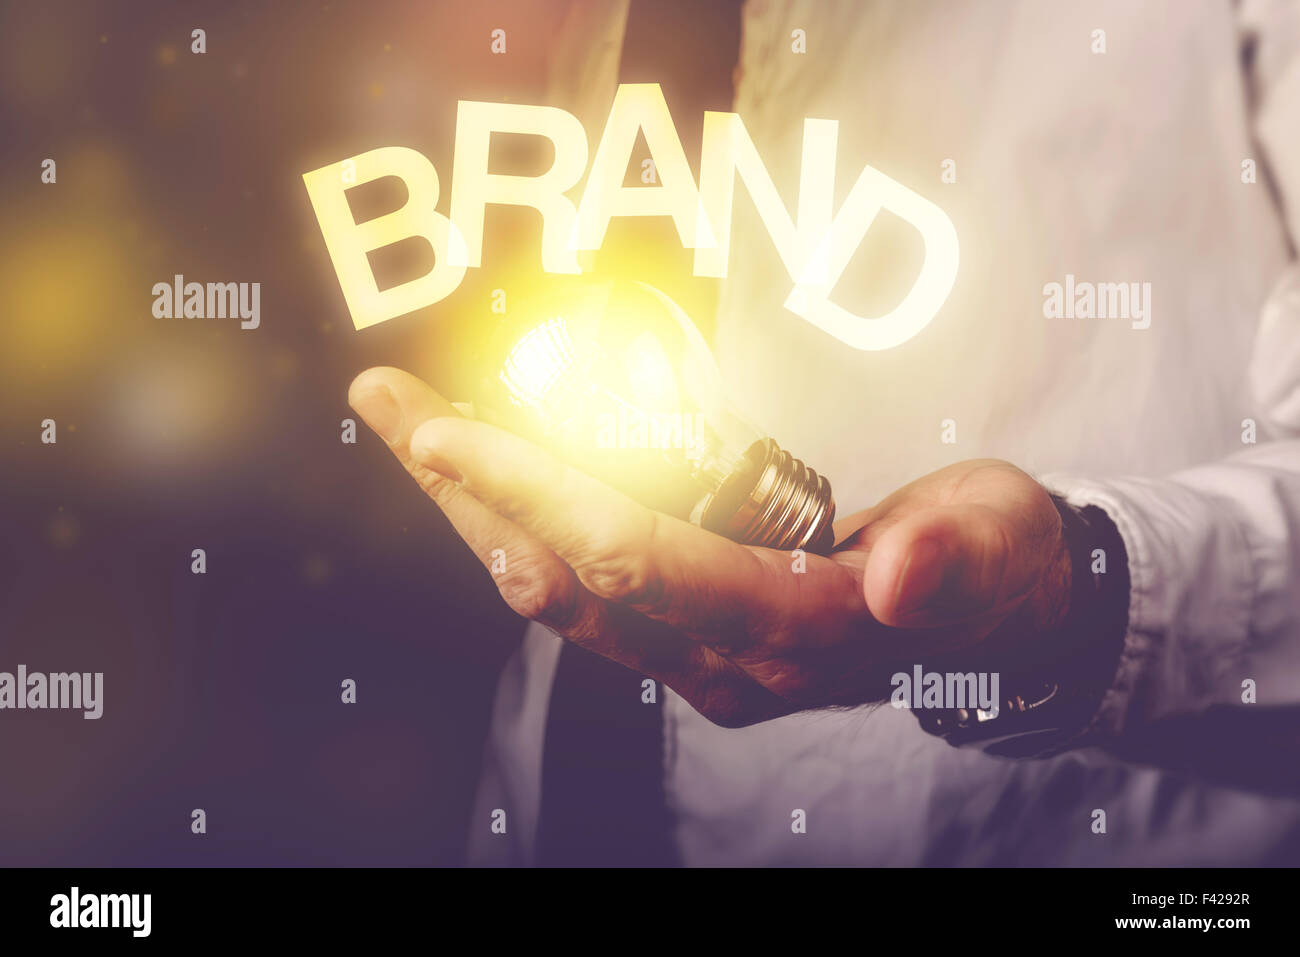 Idee Markenkonzept mit Geschäftsmann Betrieb Glühbirne, getönten Retro Bild, selektiven Fokus. Stockbild